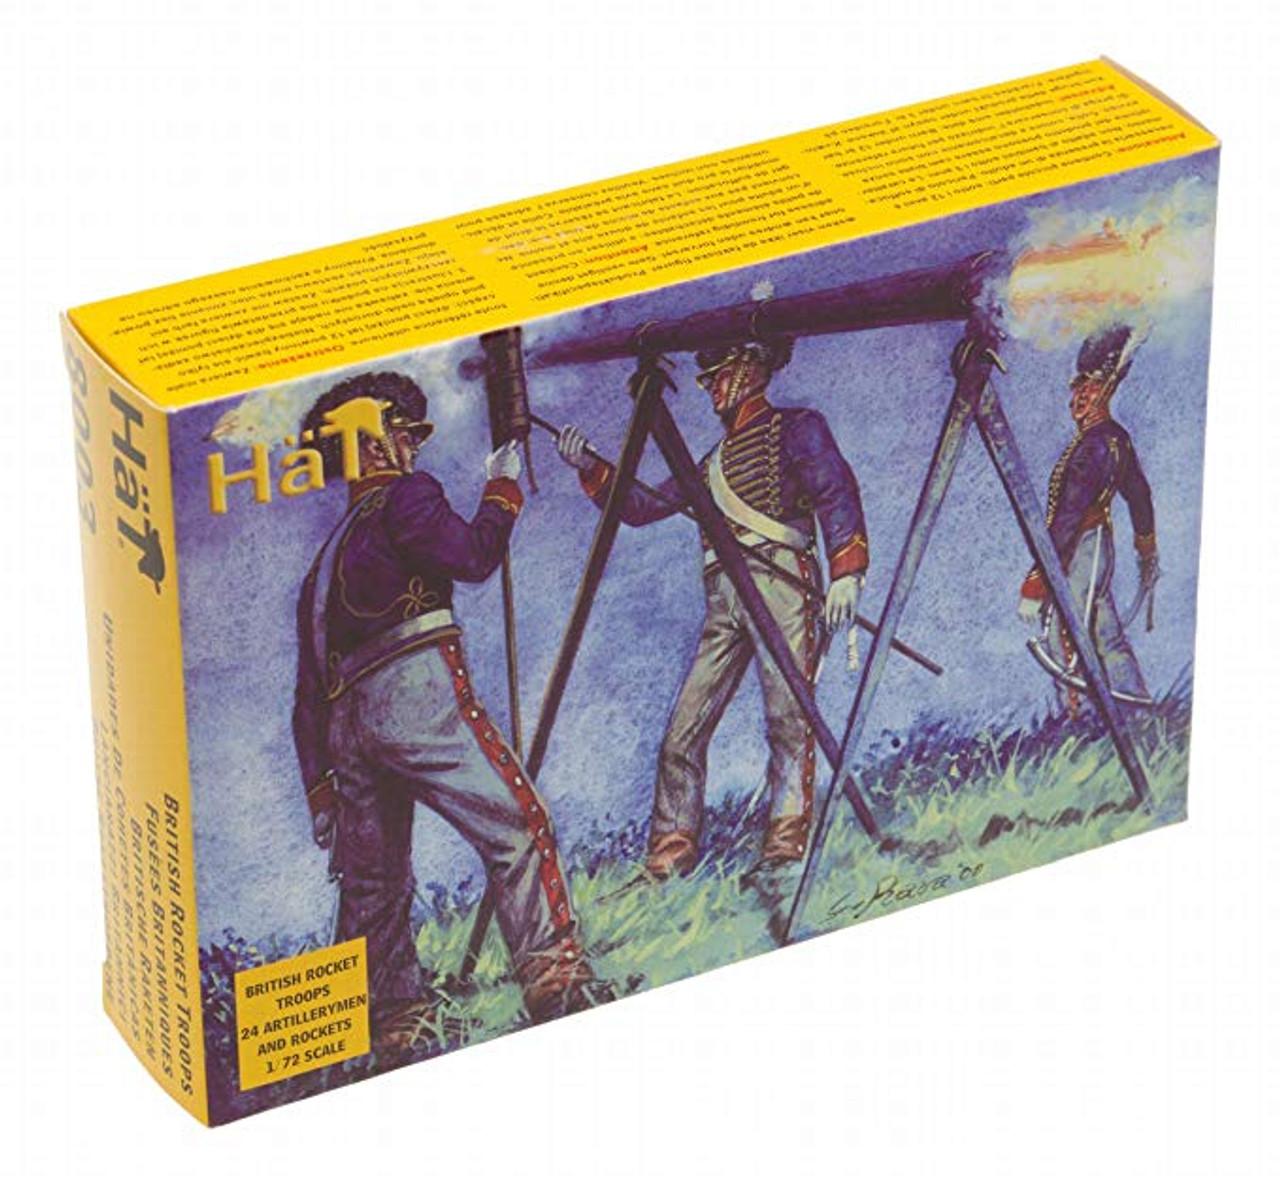 HaT 8003 Napoleonic British Rocket Troops Figures 1:72 Scale